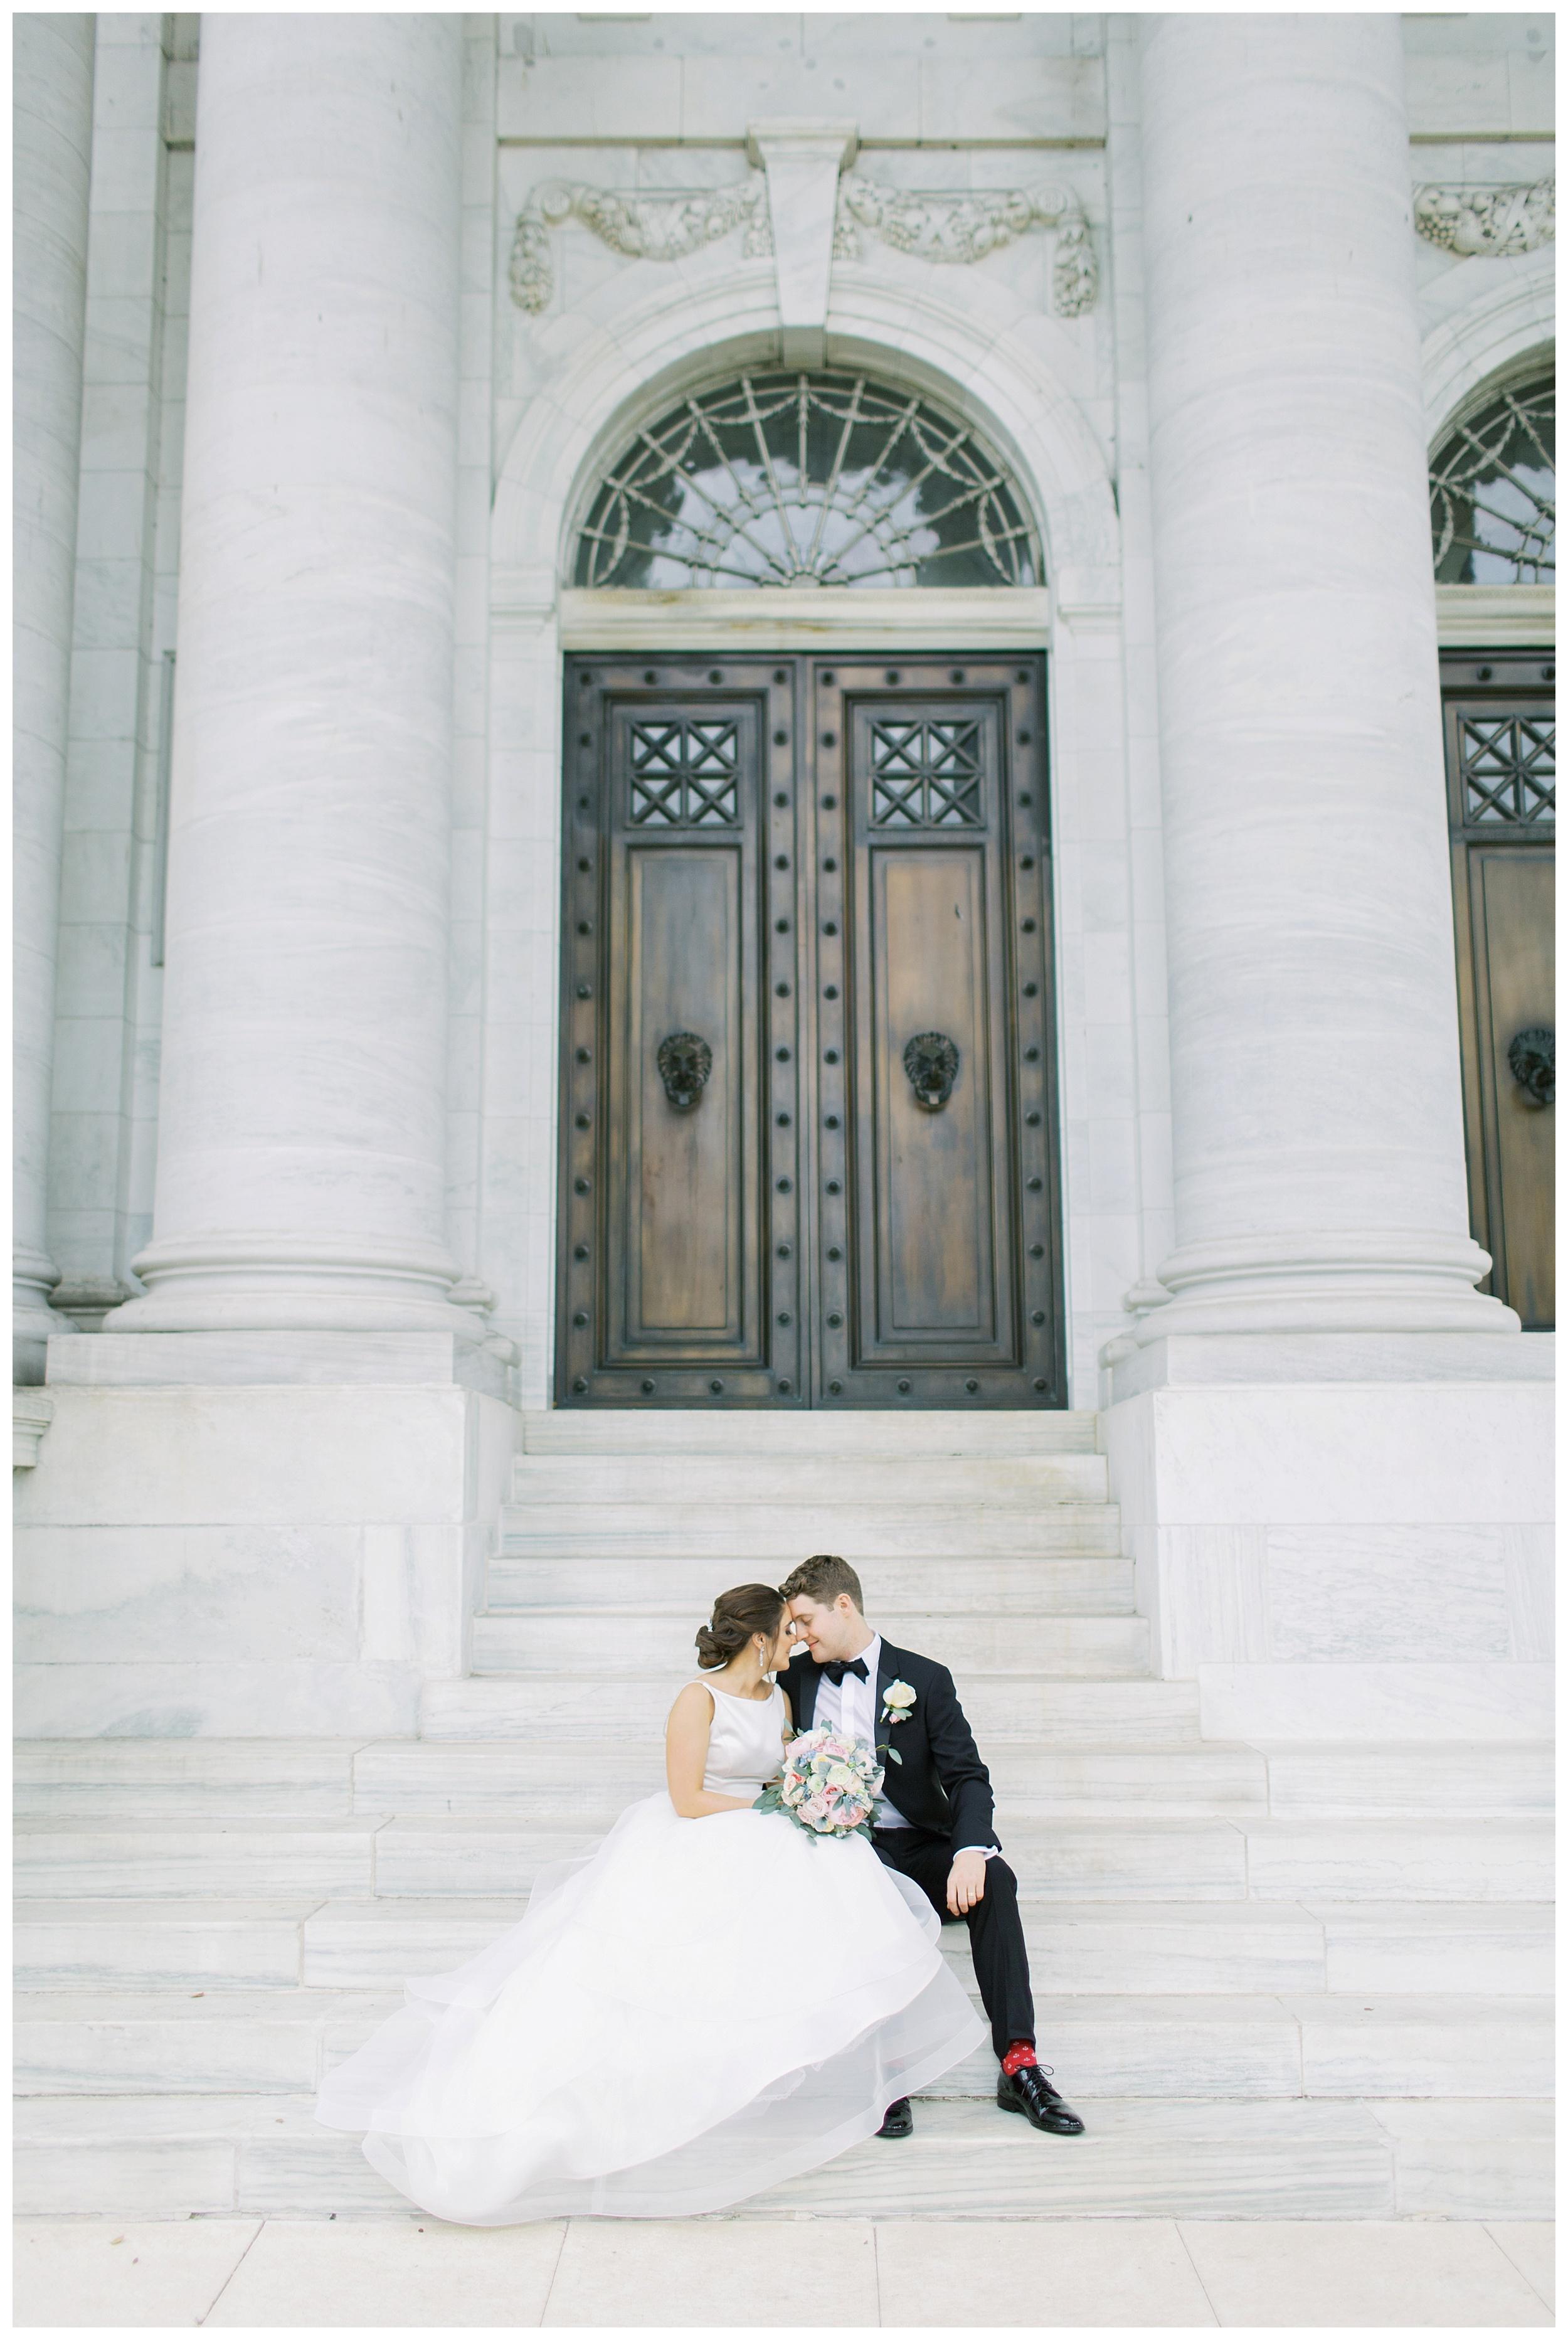 DAR Constitution Hall Wedding Wedding | Daughters of the American Revolution Wedding | District of Columbia Film Wedding Photographer Kir Tuben_0119.jpg